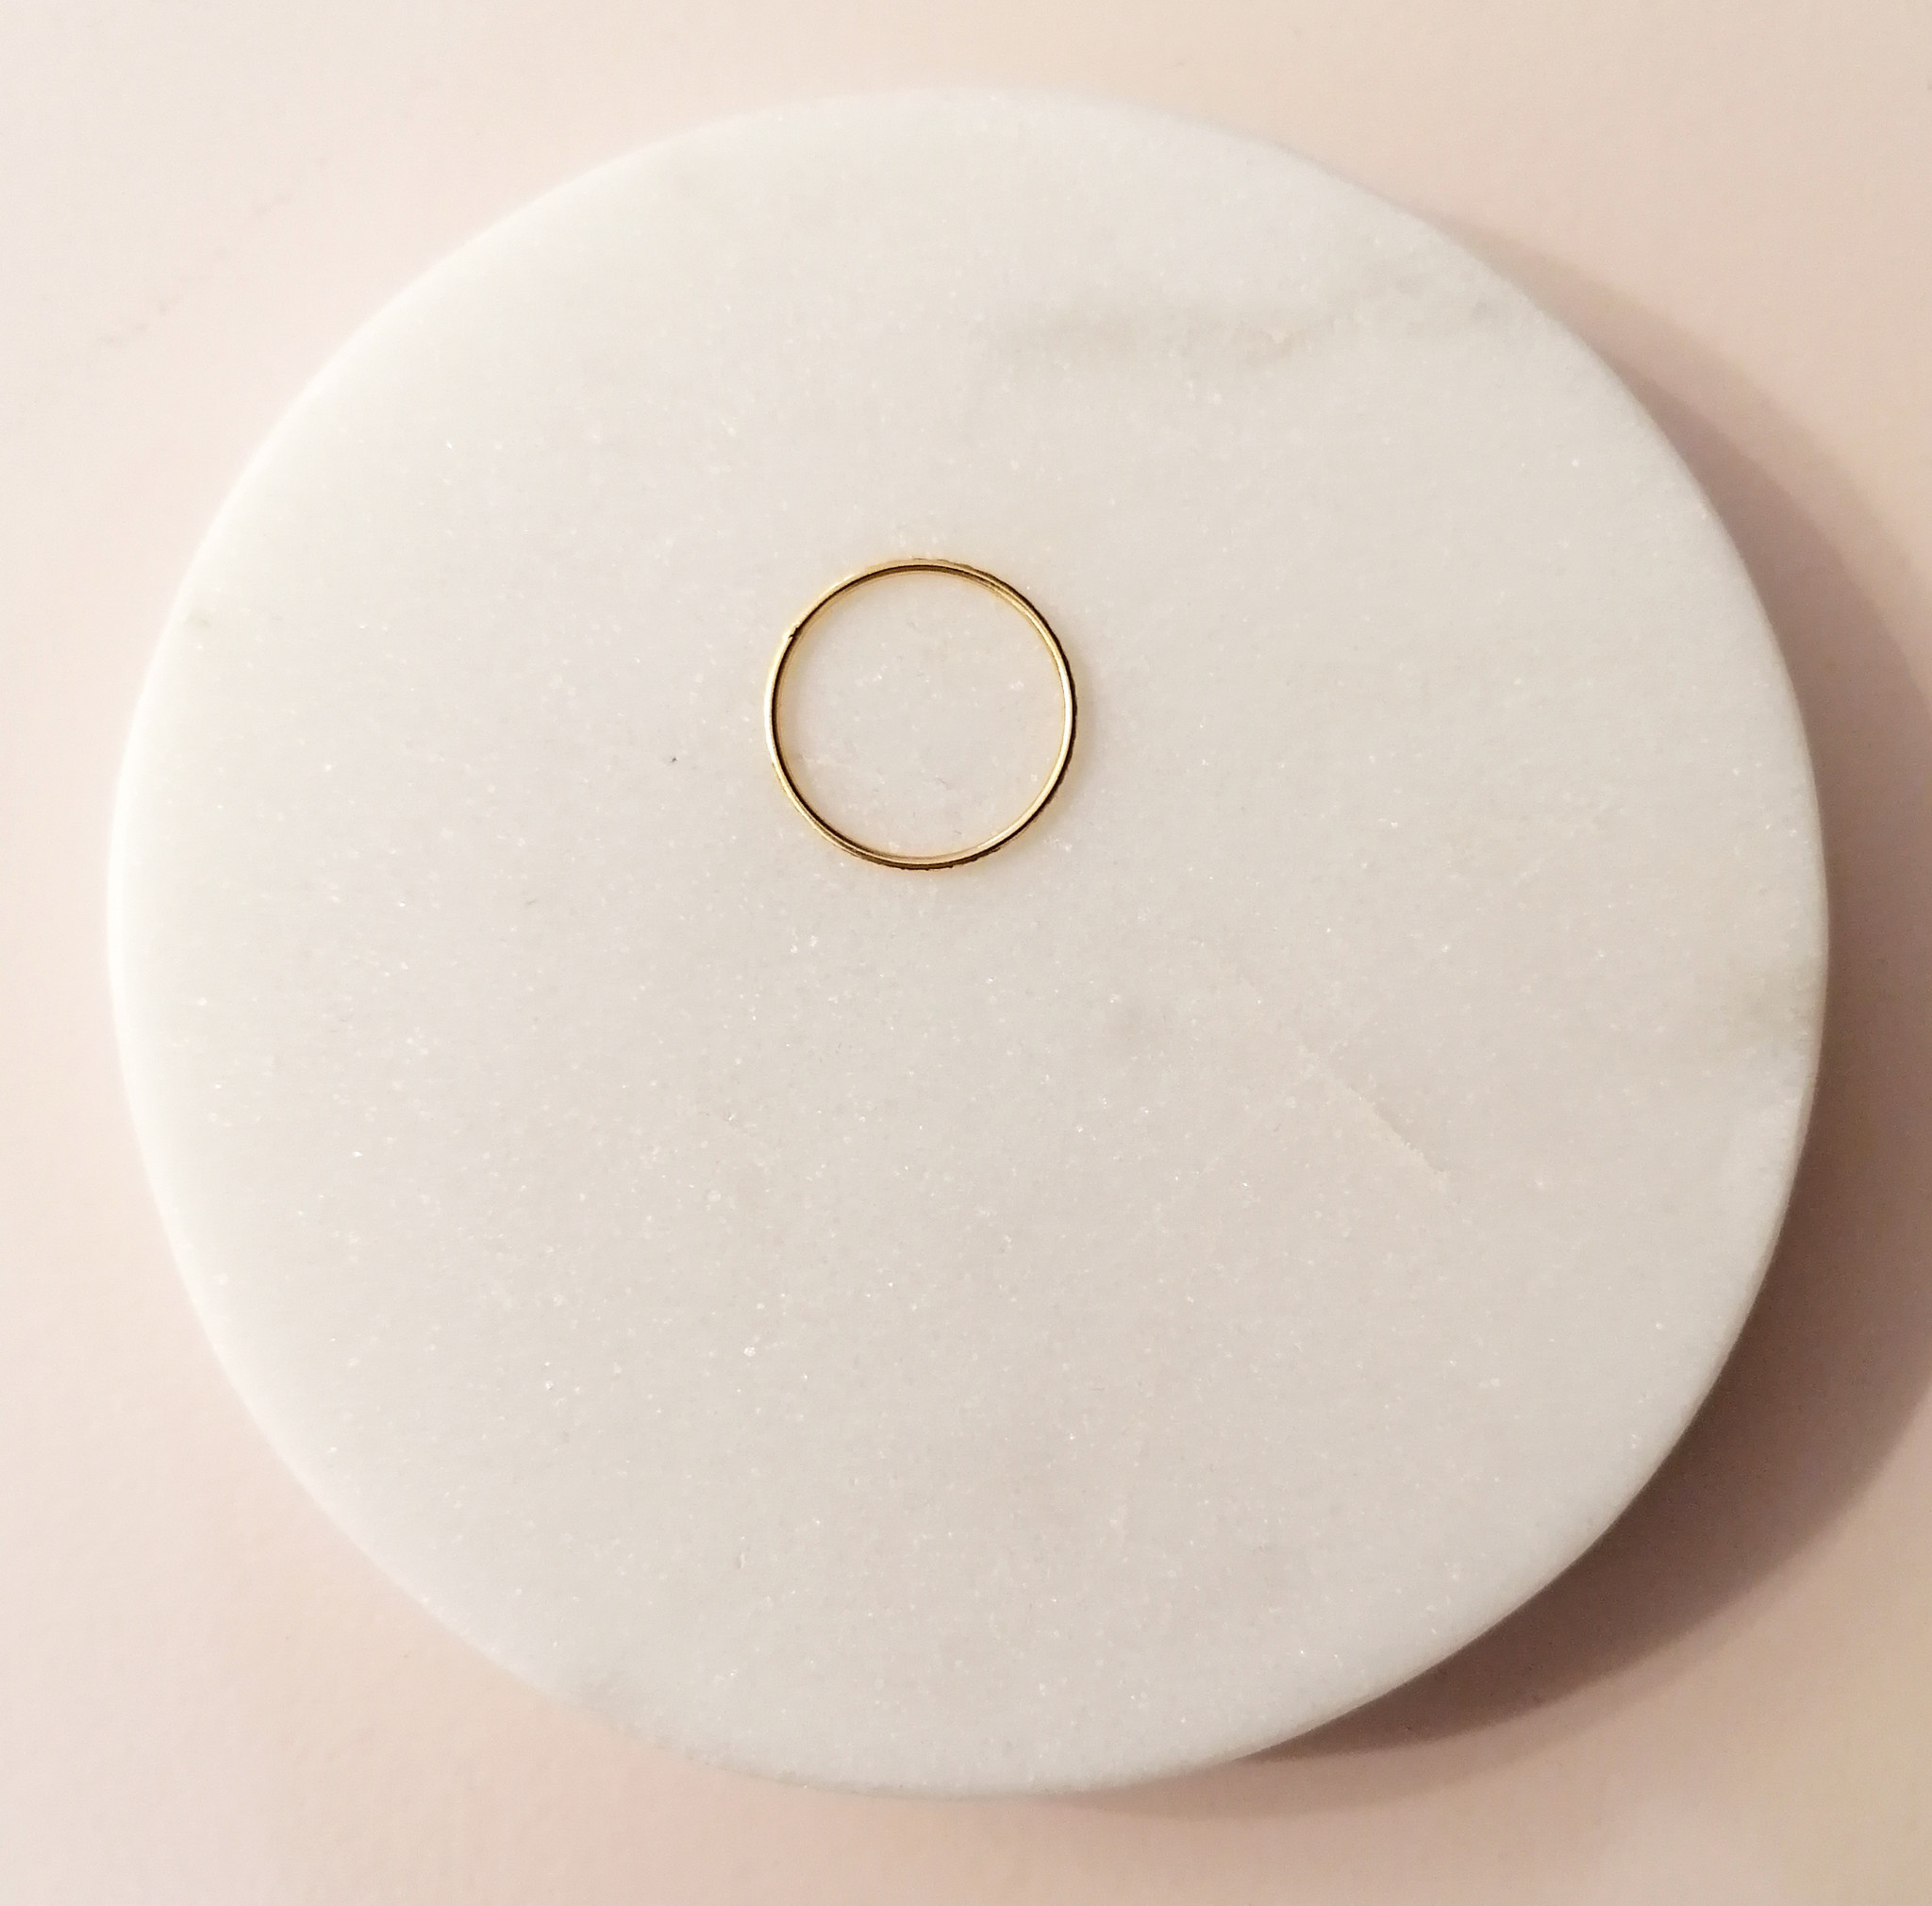 Goldring mit Facettenschliff - 925er Sterling Silber-4